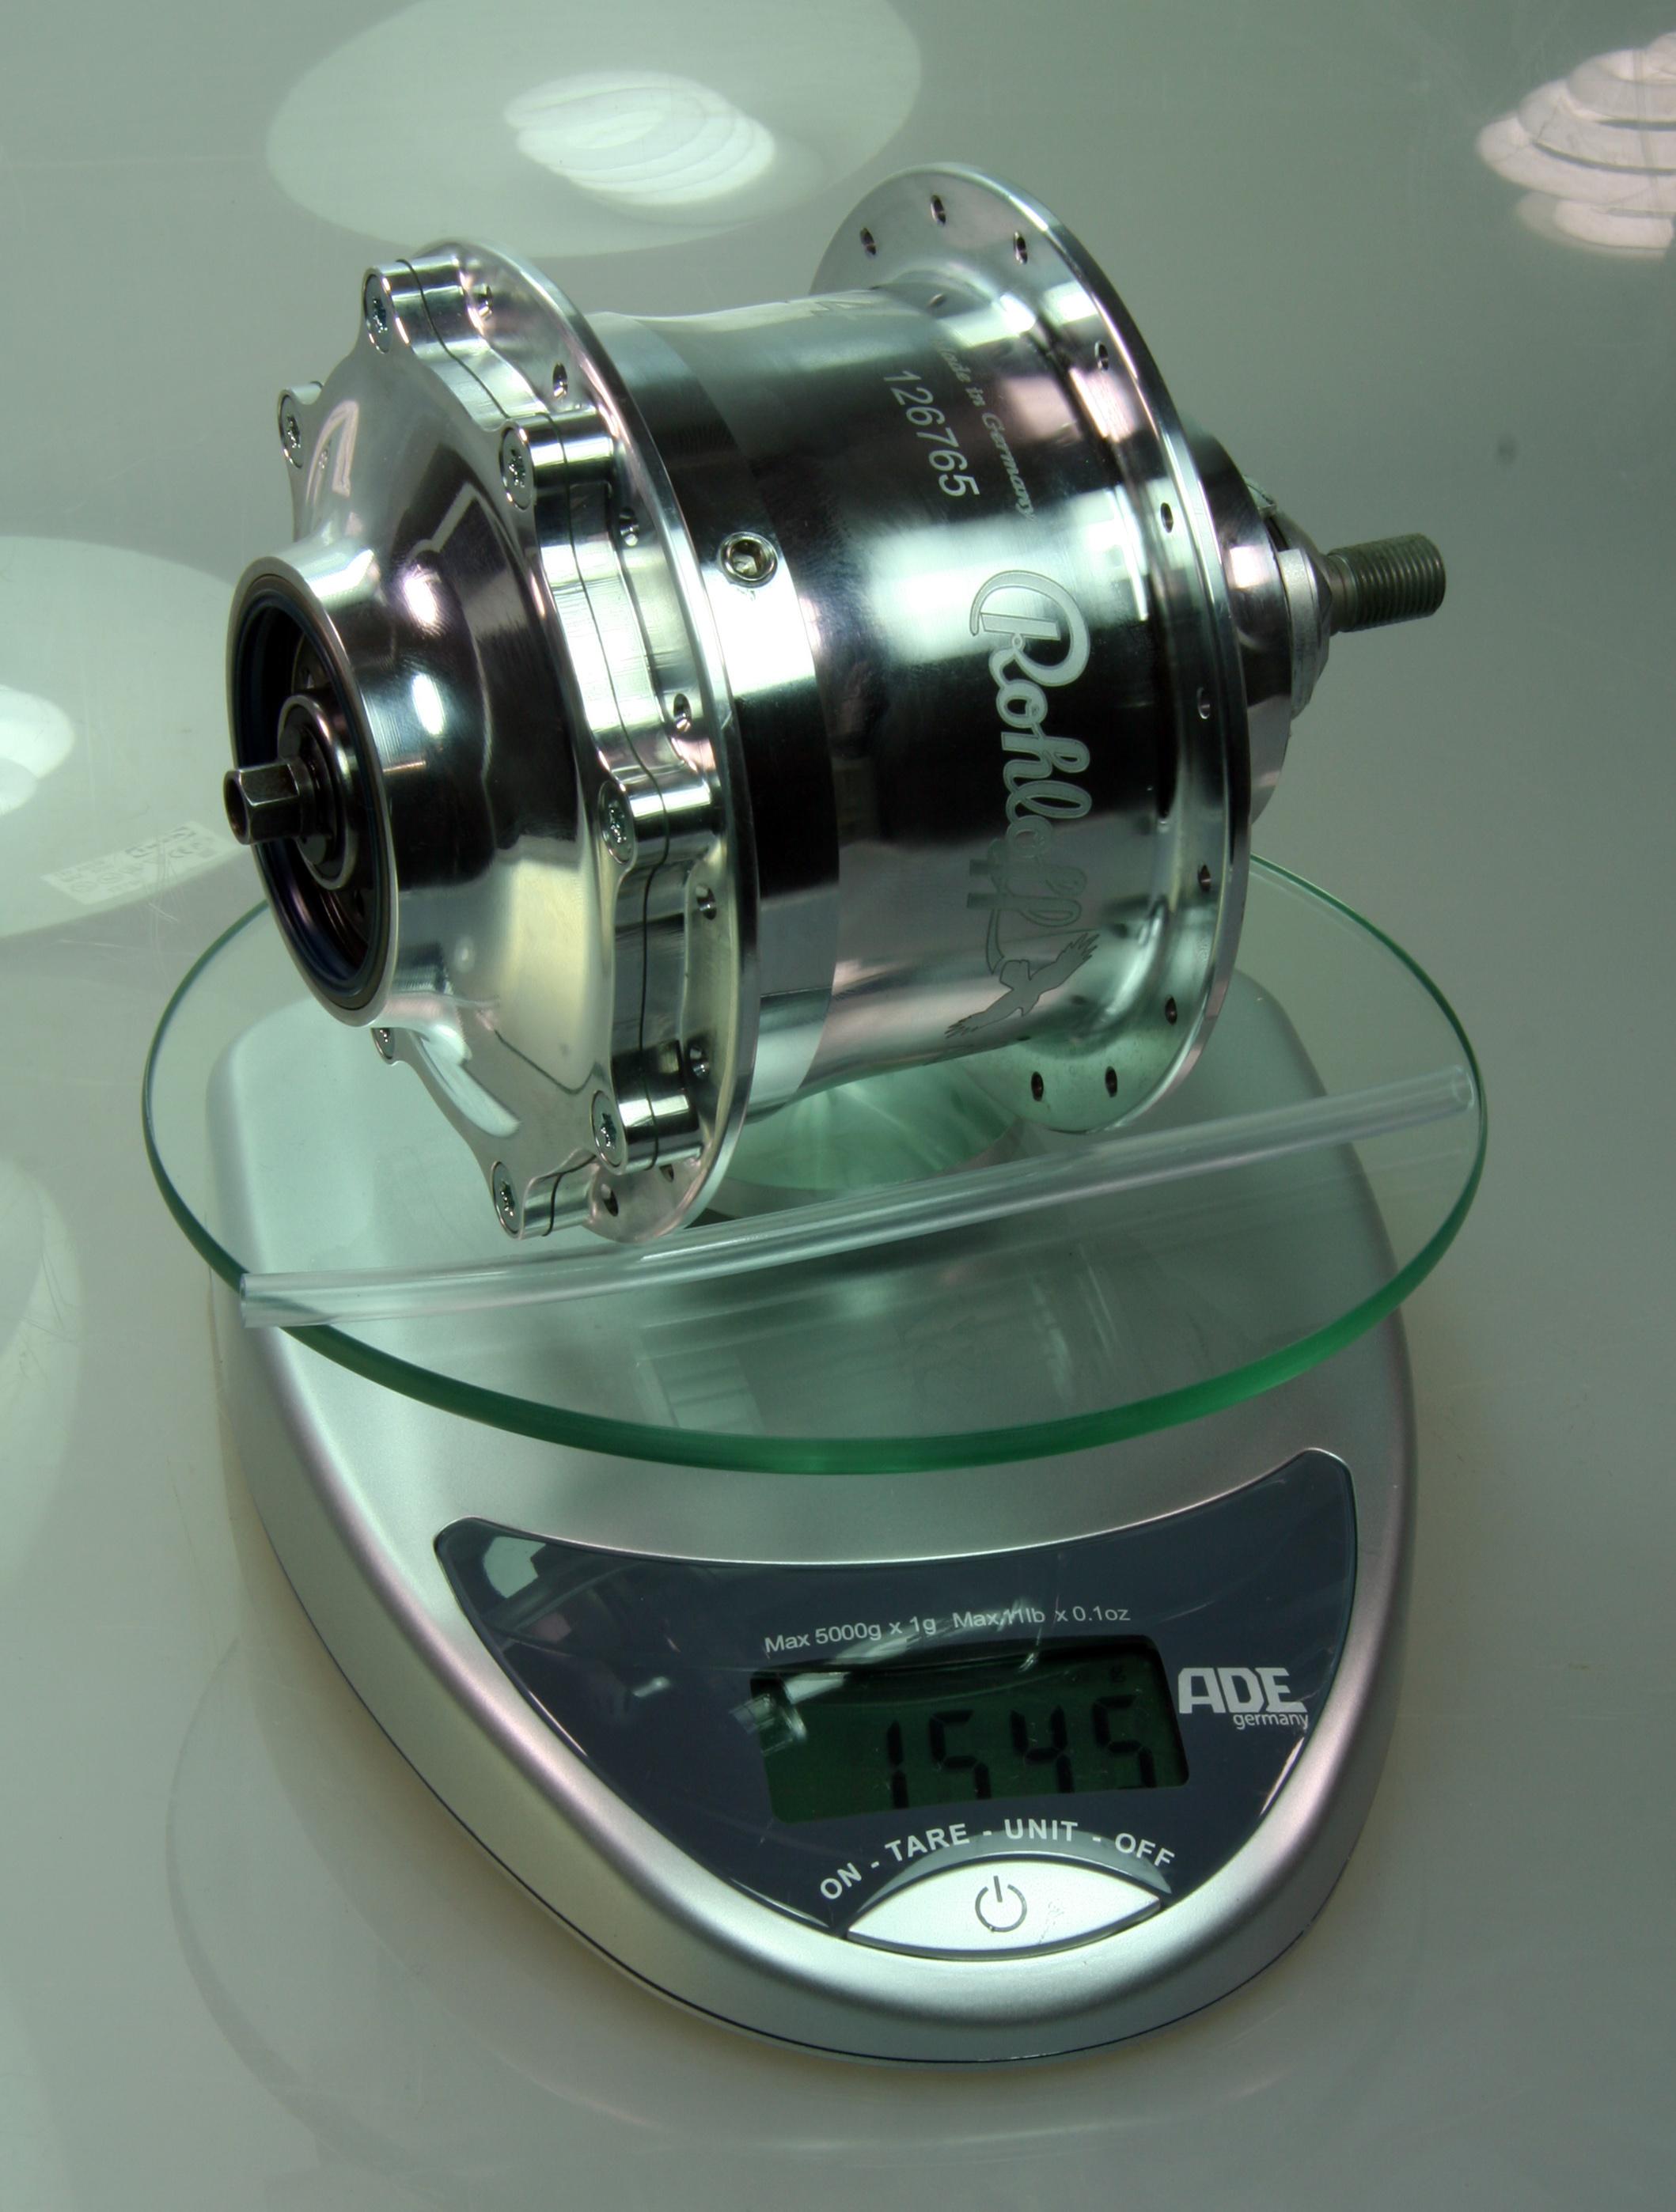 Nabenvergleich-rohloff-speedhub-shimano-alfine-02.jpg